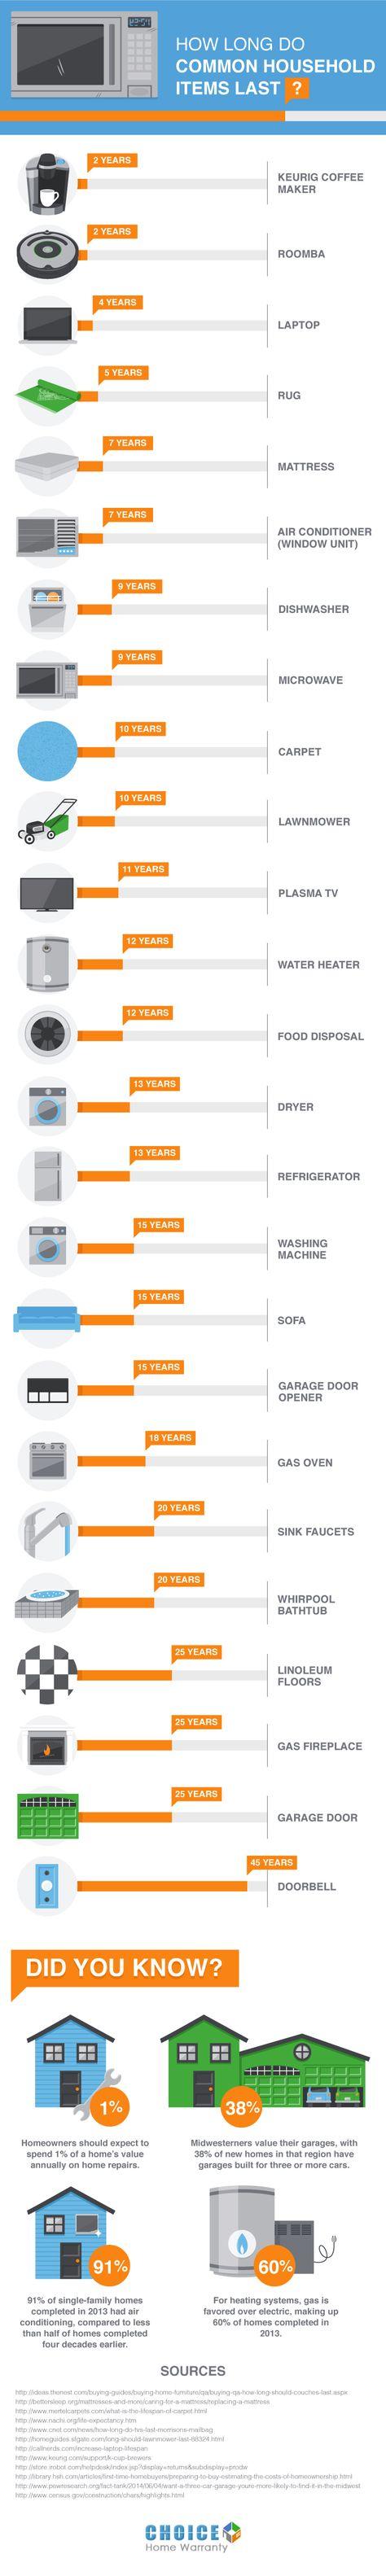 22 best Helpful Homeowner Information images on Pinterest ...